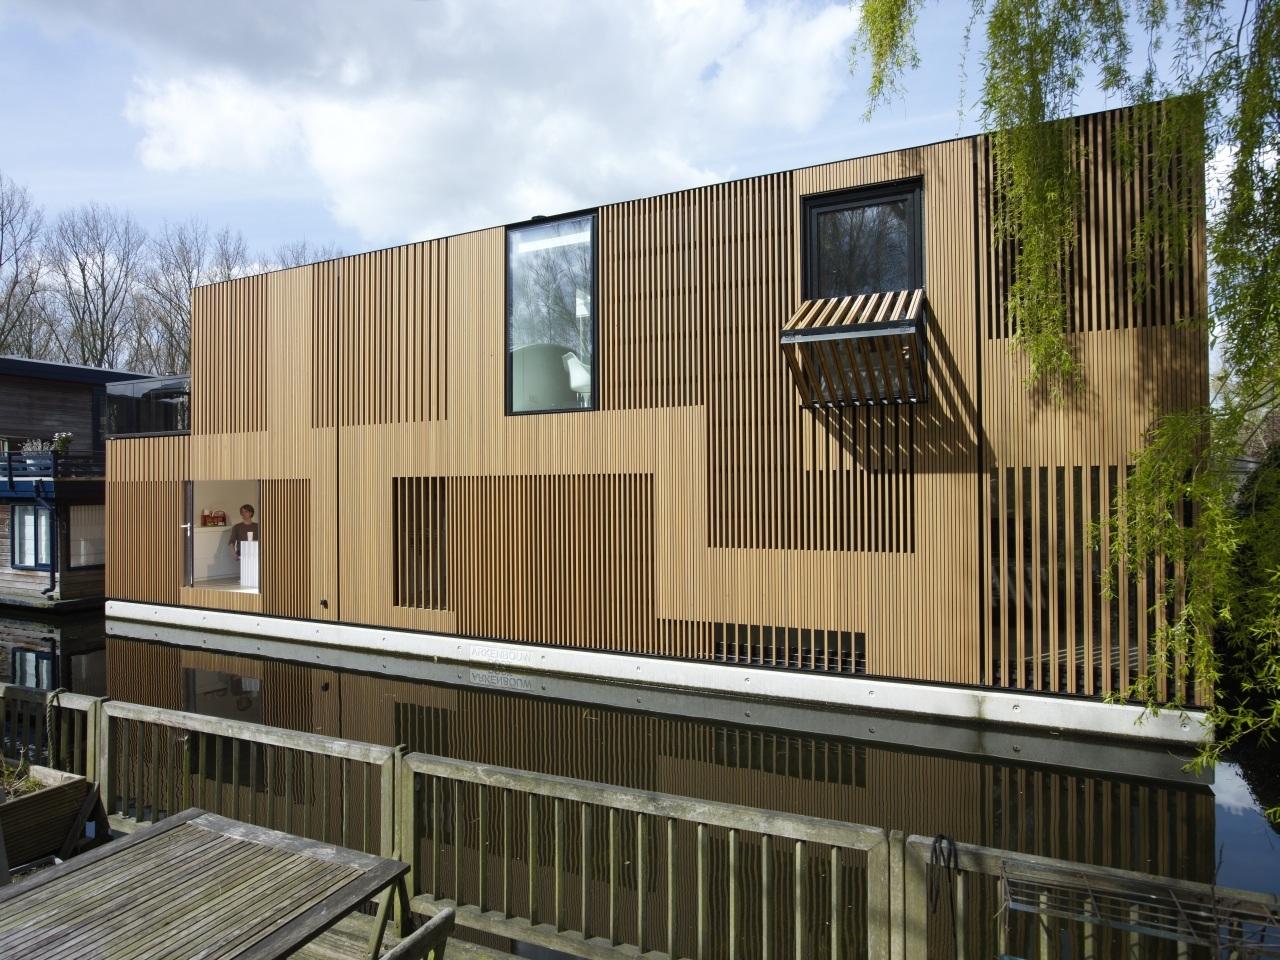 Water Villa / Framework Architects + Studio Prototype, © Jeroen Musch